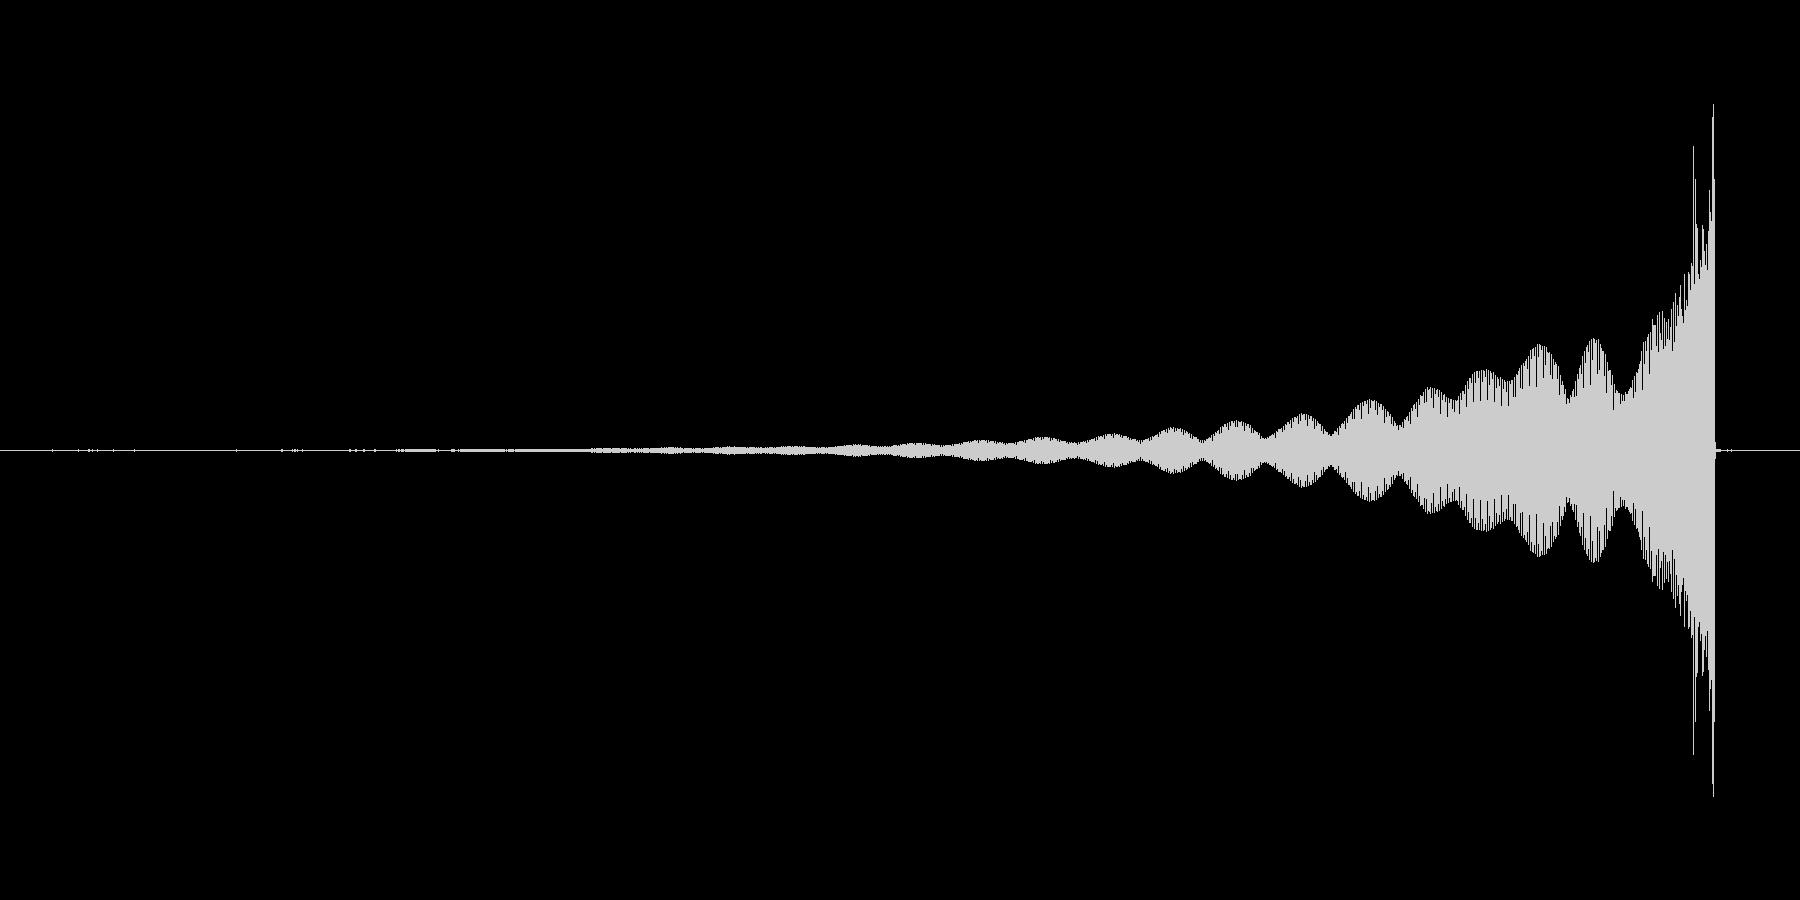 【心理/心情系効果音】緊張、緊張感の未再生の波形